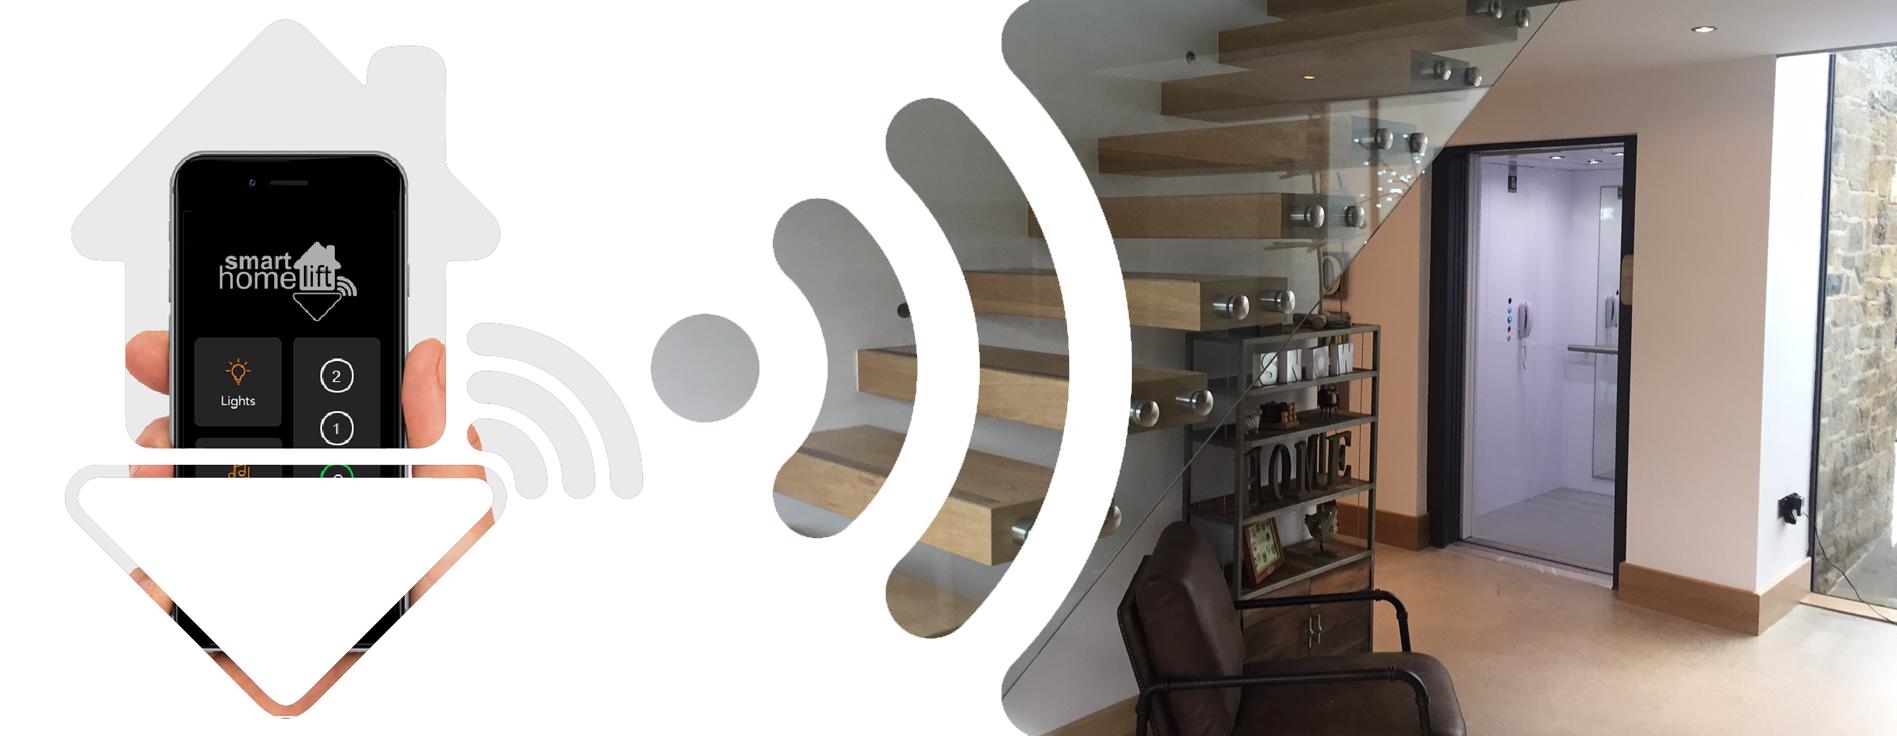 Smart Home Lift Intro - Smart Home Lift